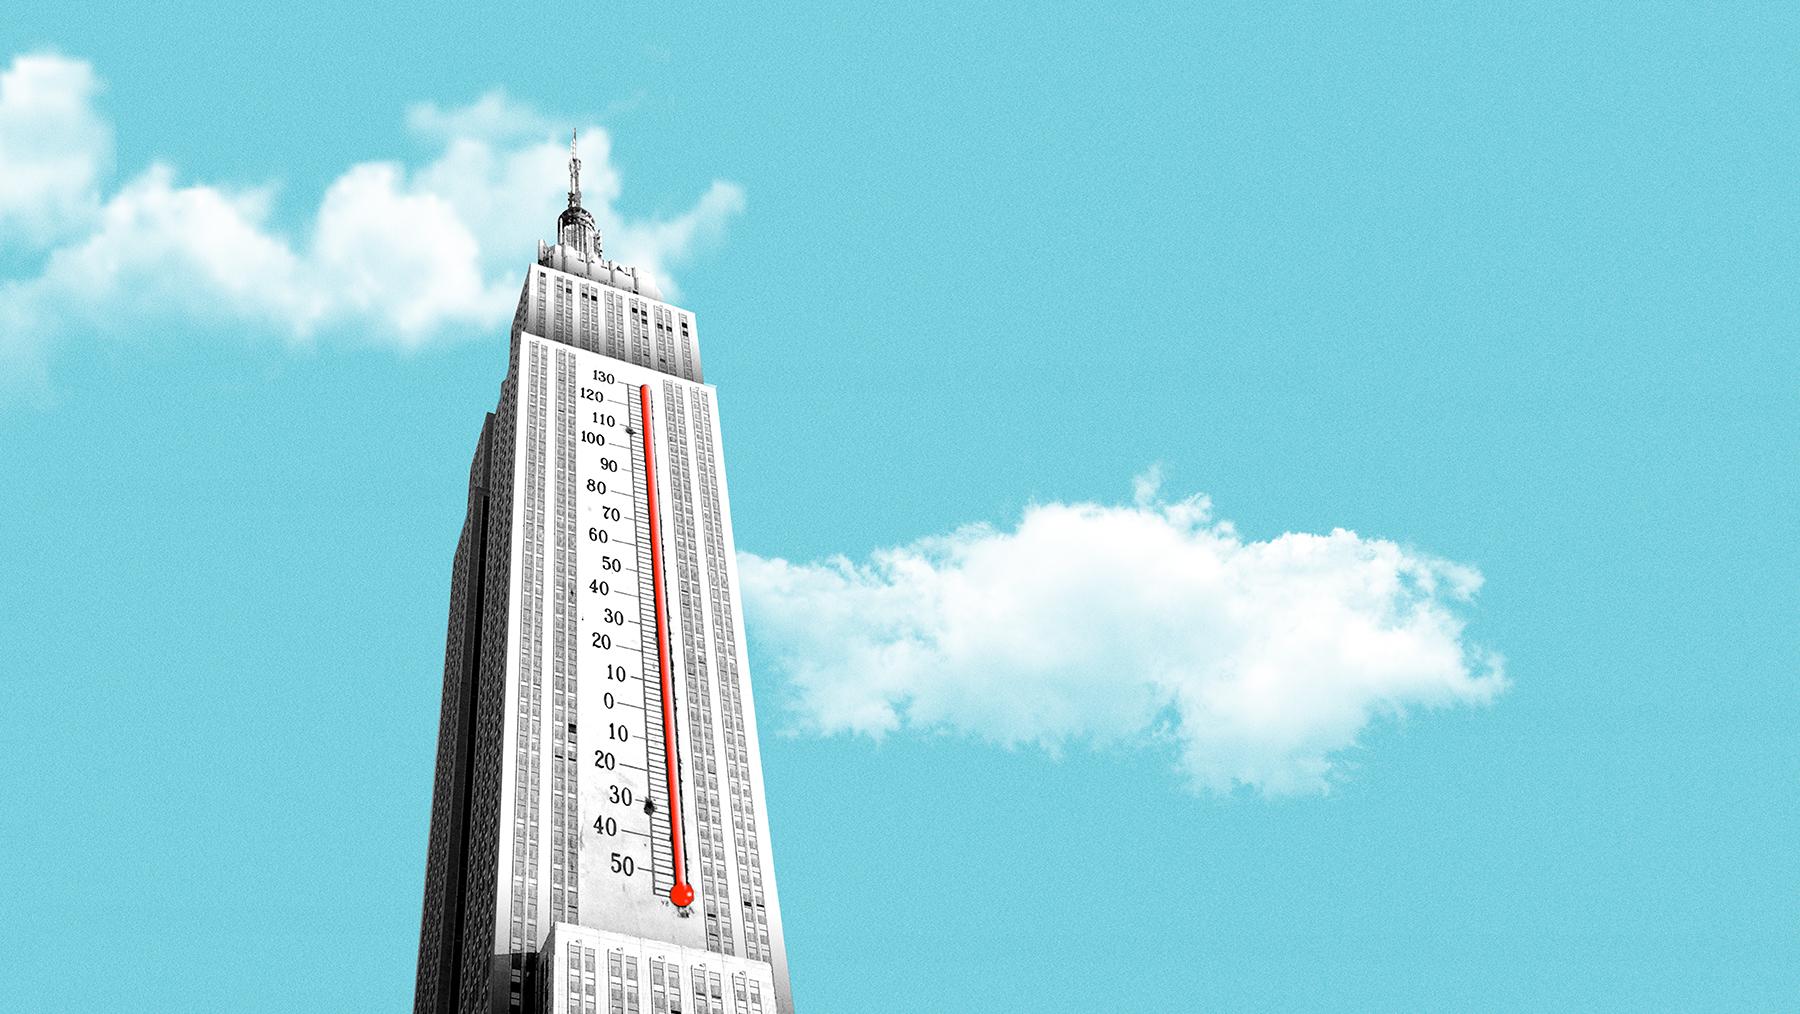 skyscraper graphic by Michael Vincent